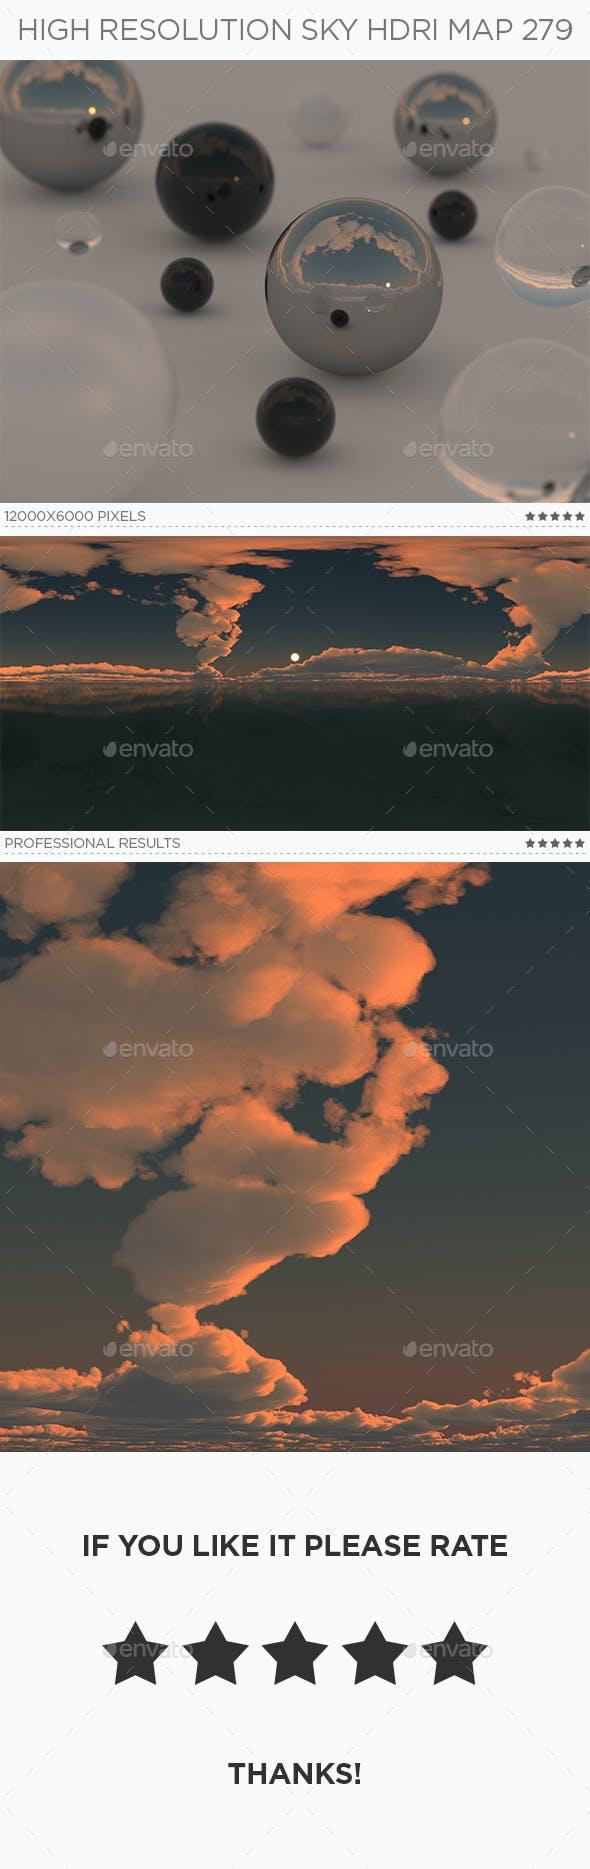 High Resolution Sky HDRi Map 279 - 3DOcean Item for Sale